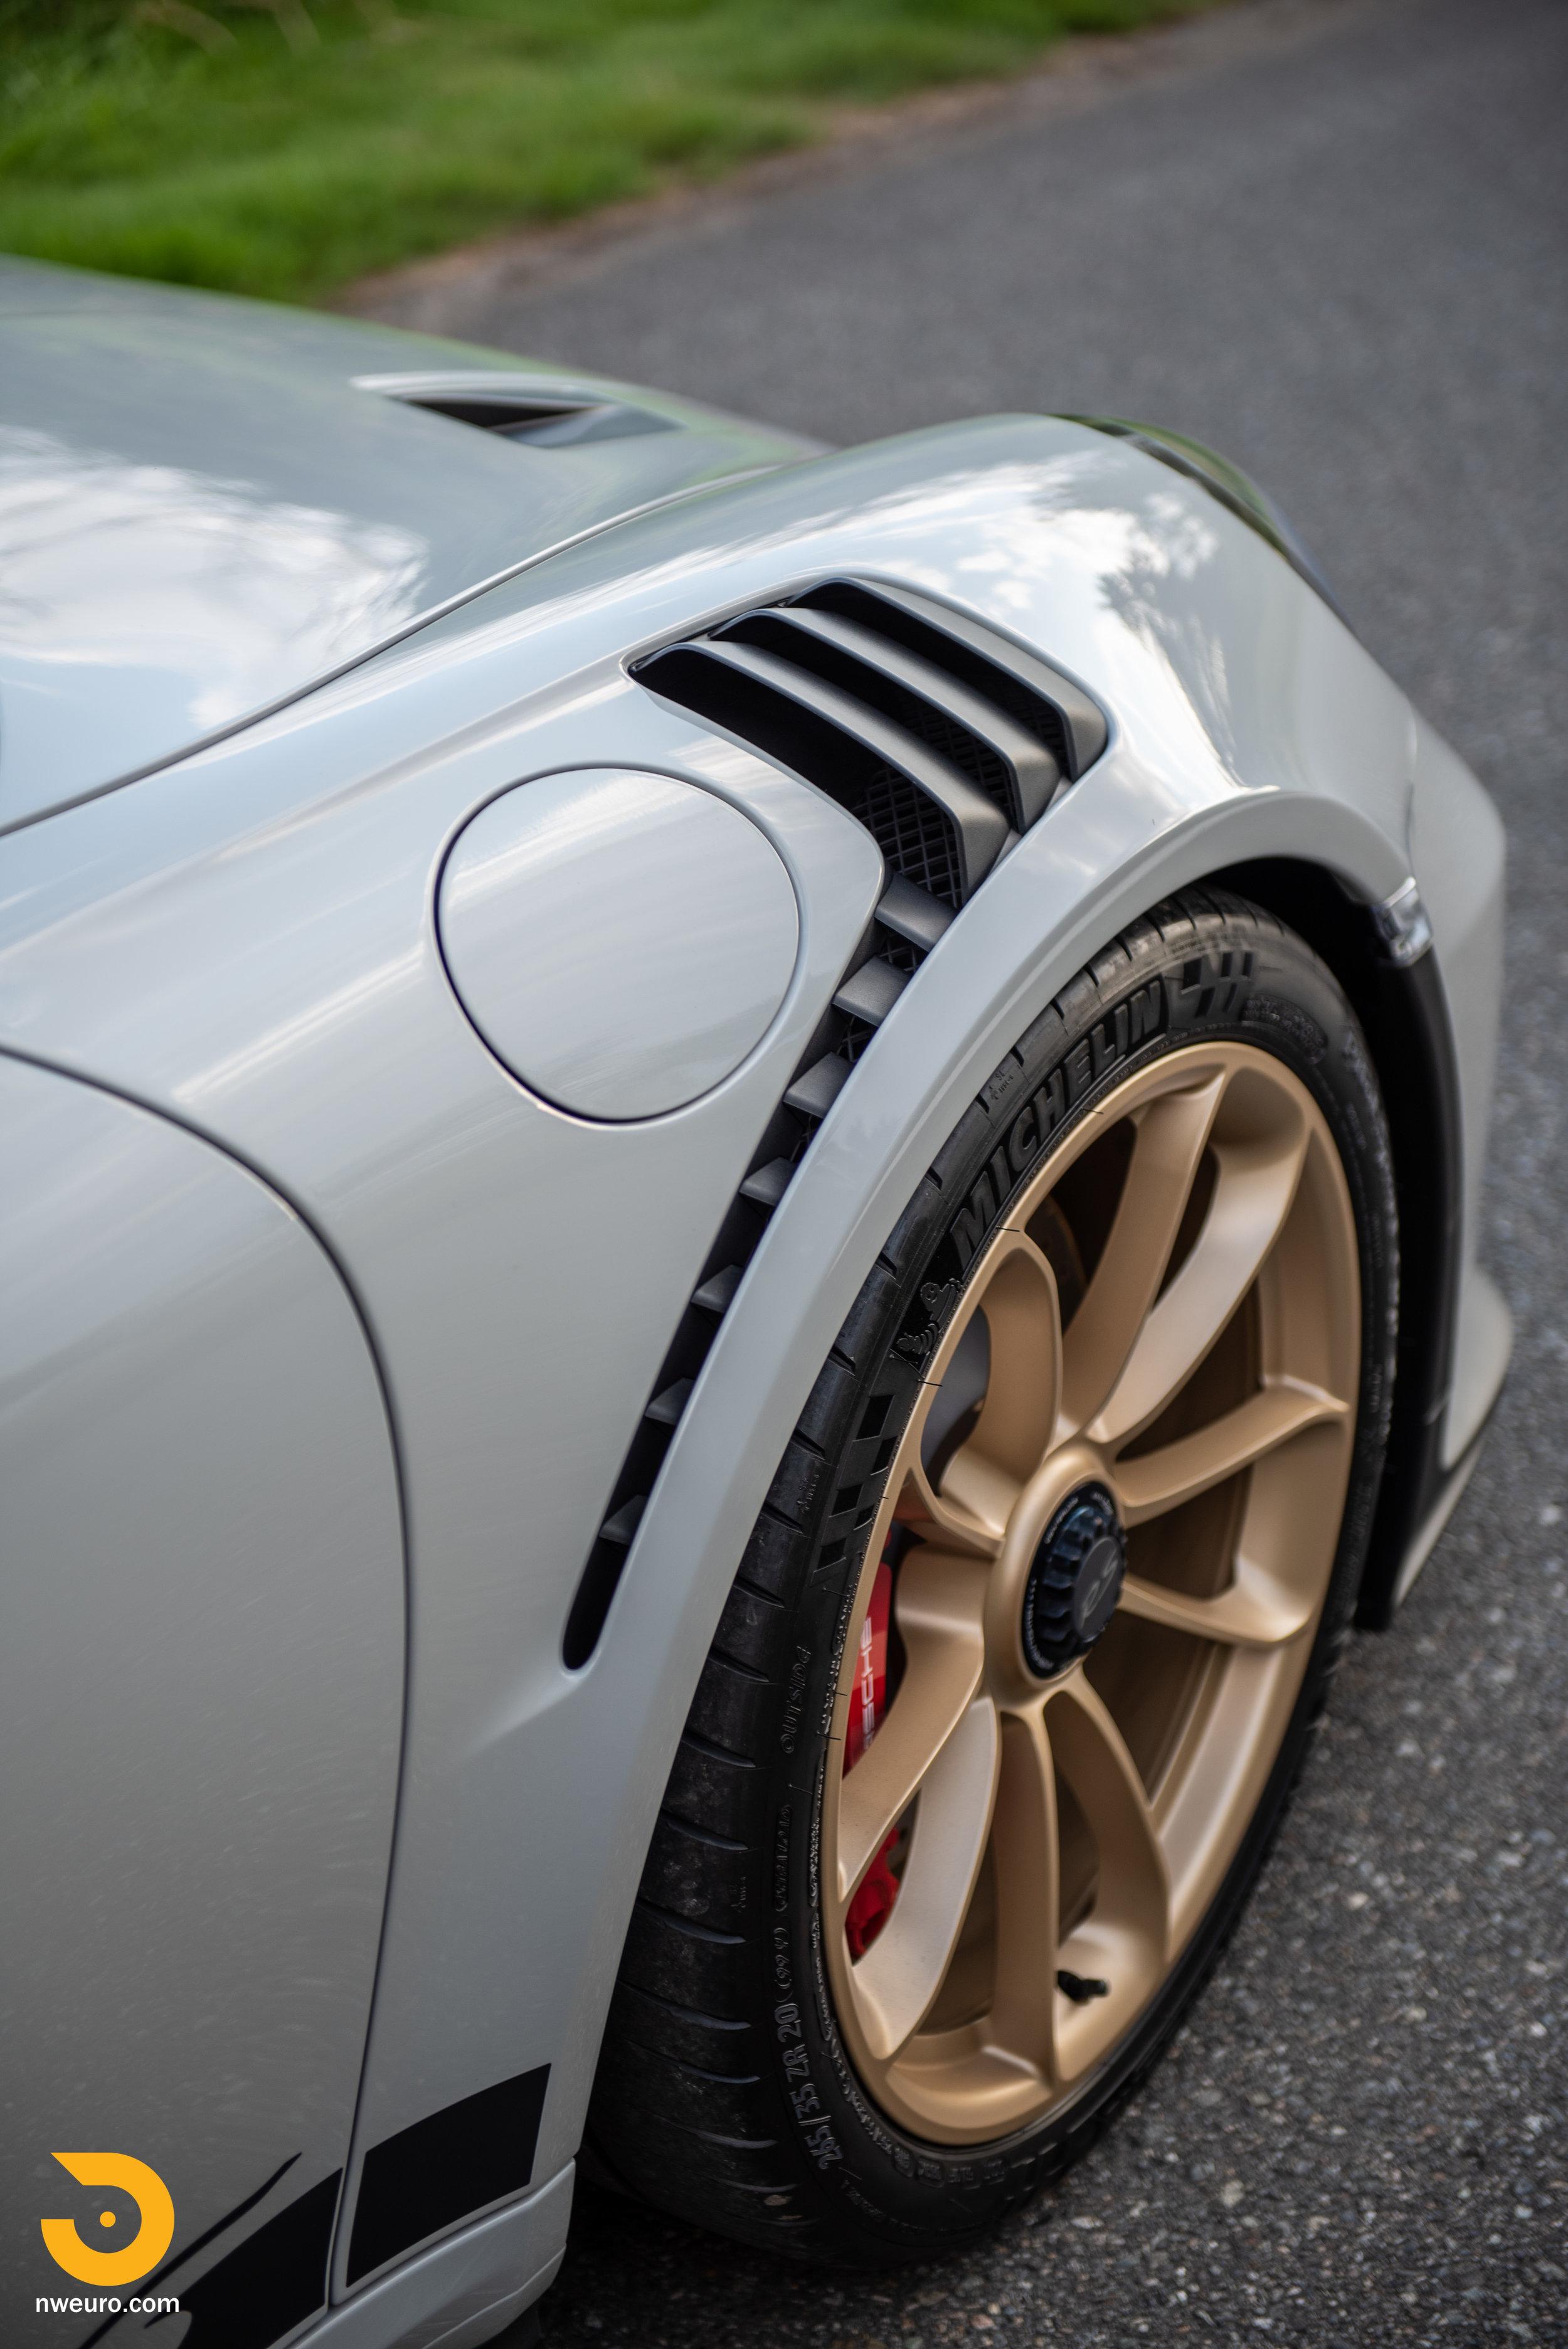 2019 Porsche GT3 RS - Chalk-63.jpg